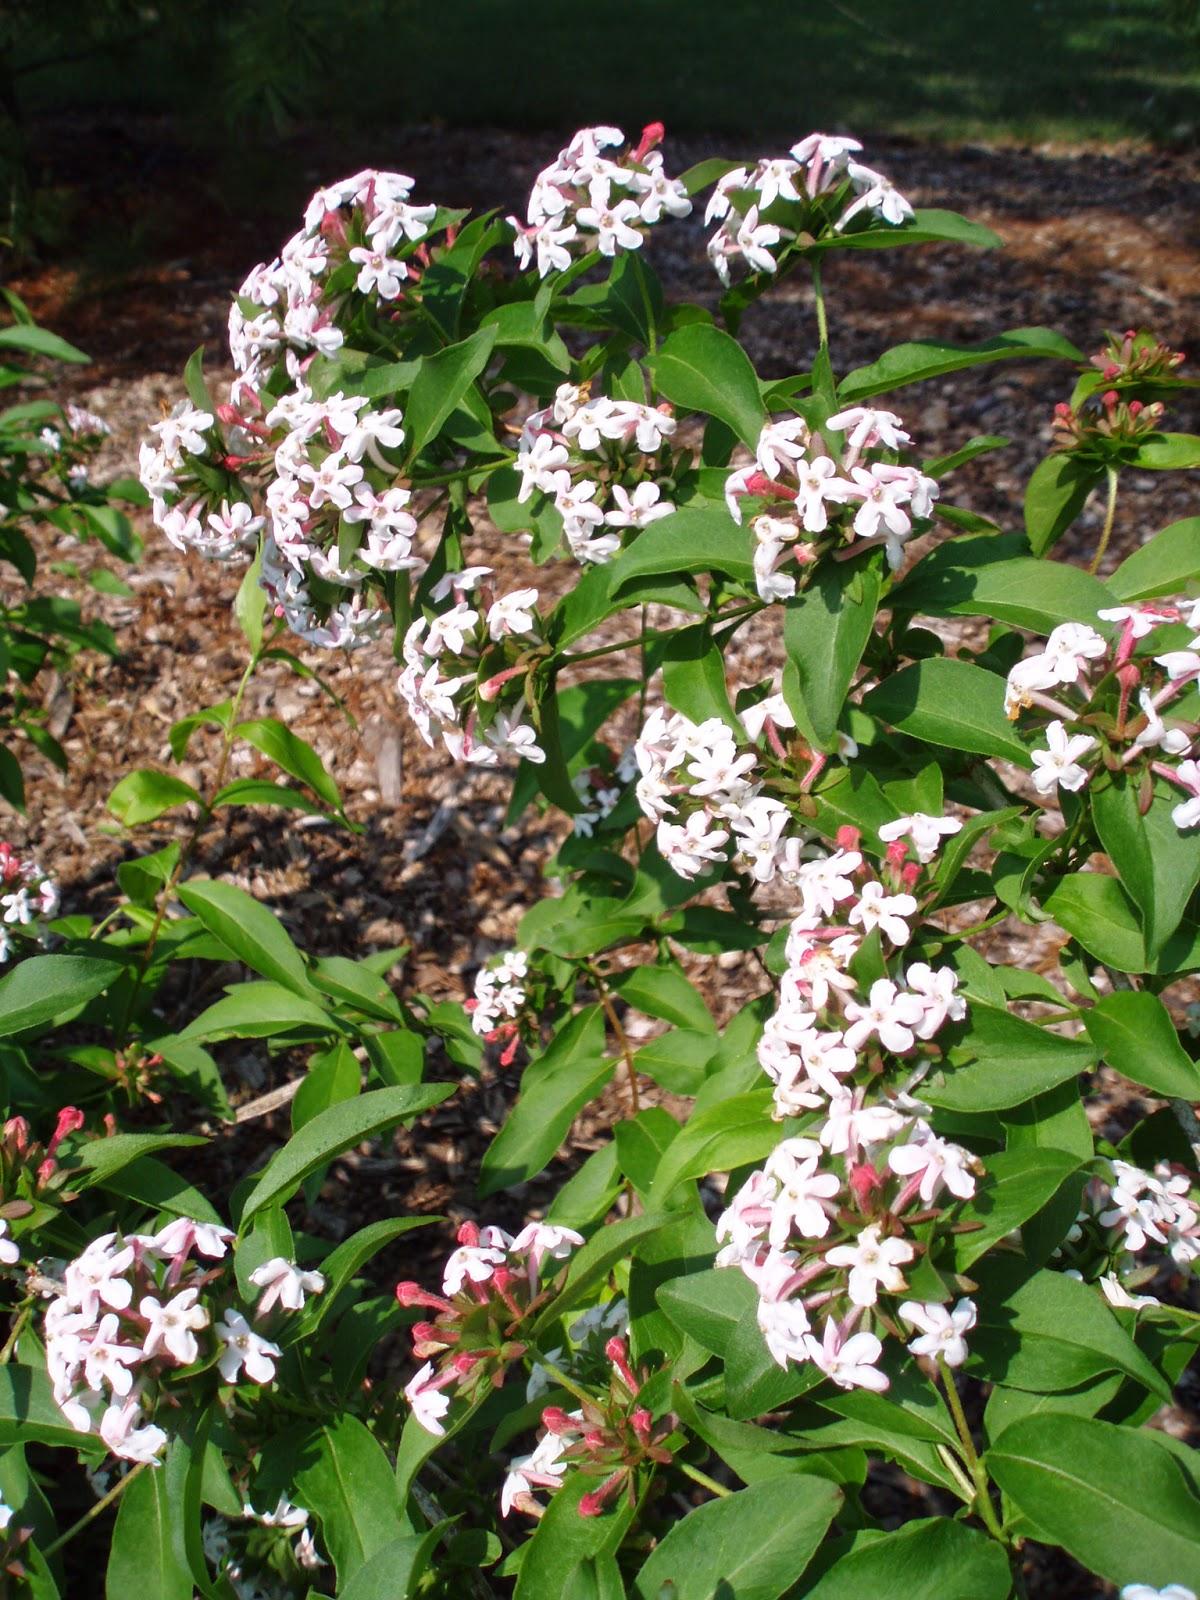 Fragrant Abelia For Spring Scent Marks Garden Ruminations